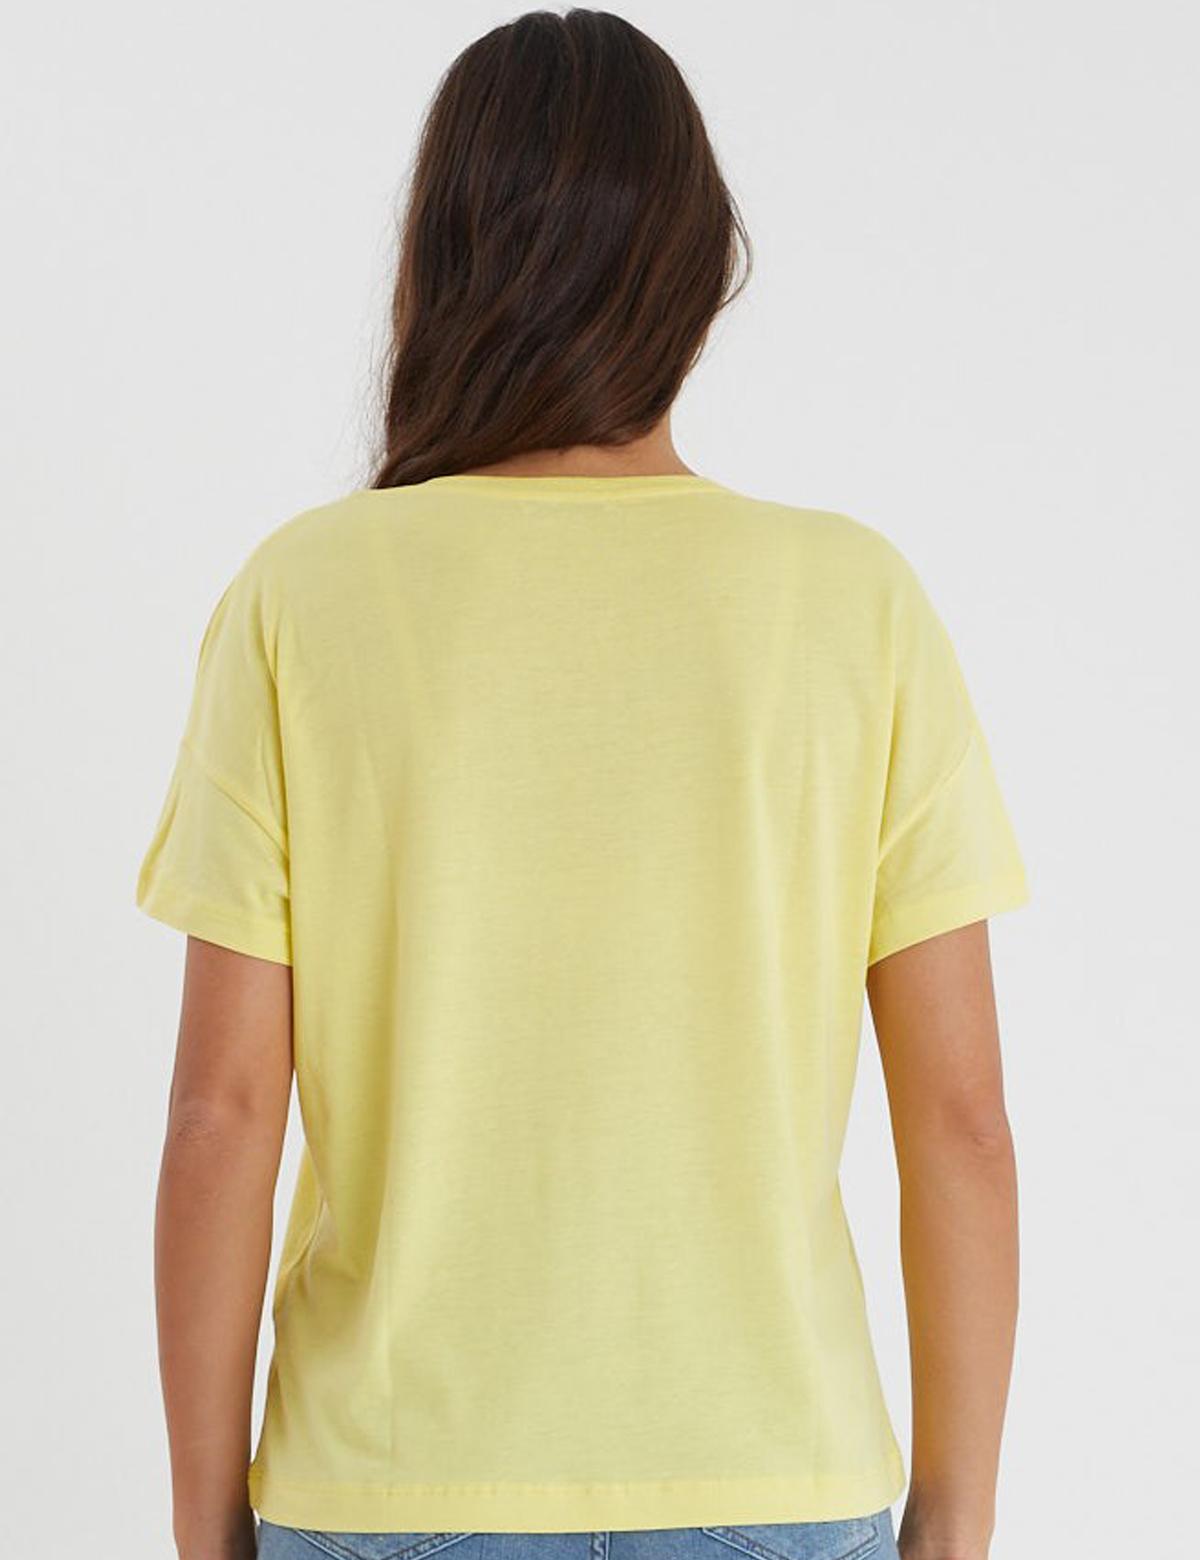 Футболка жовта6